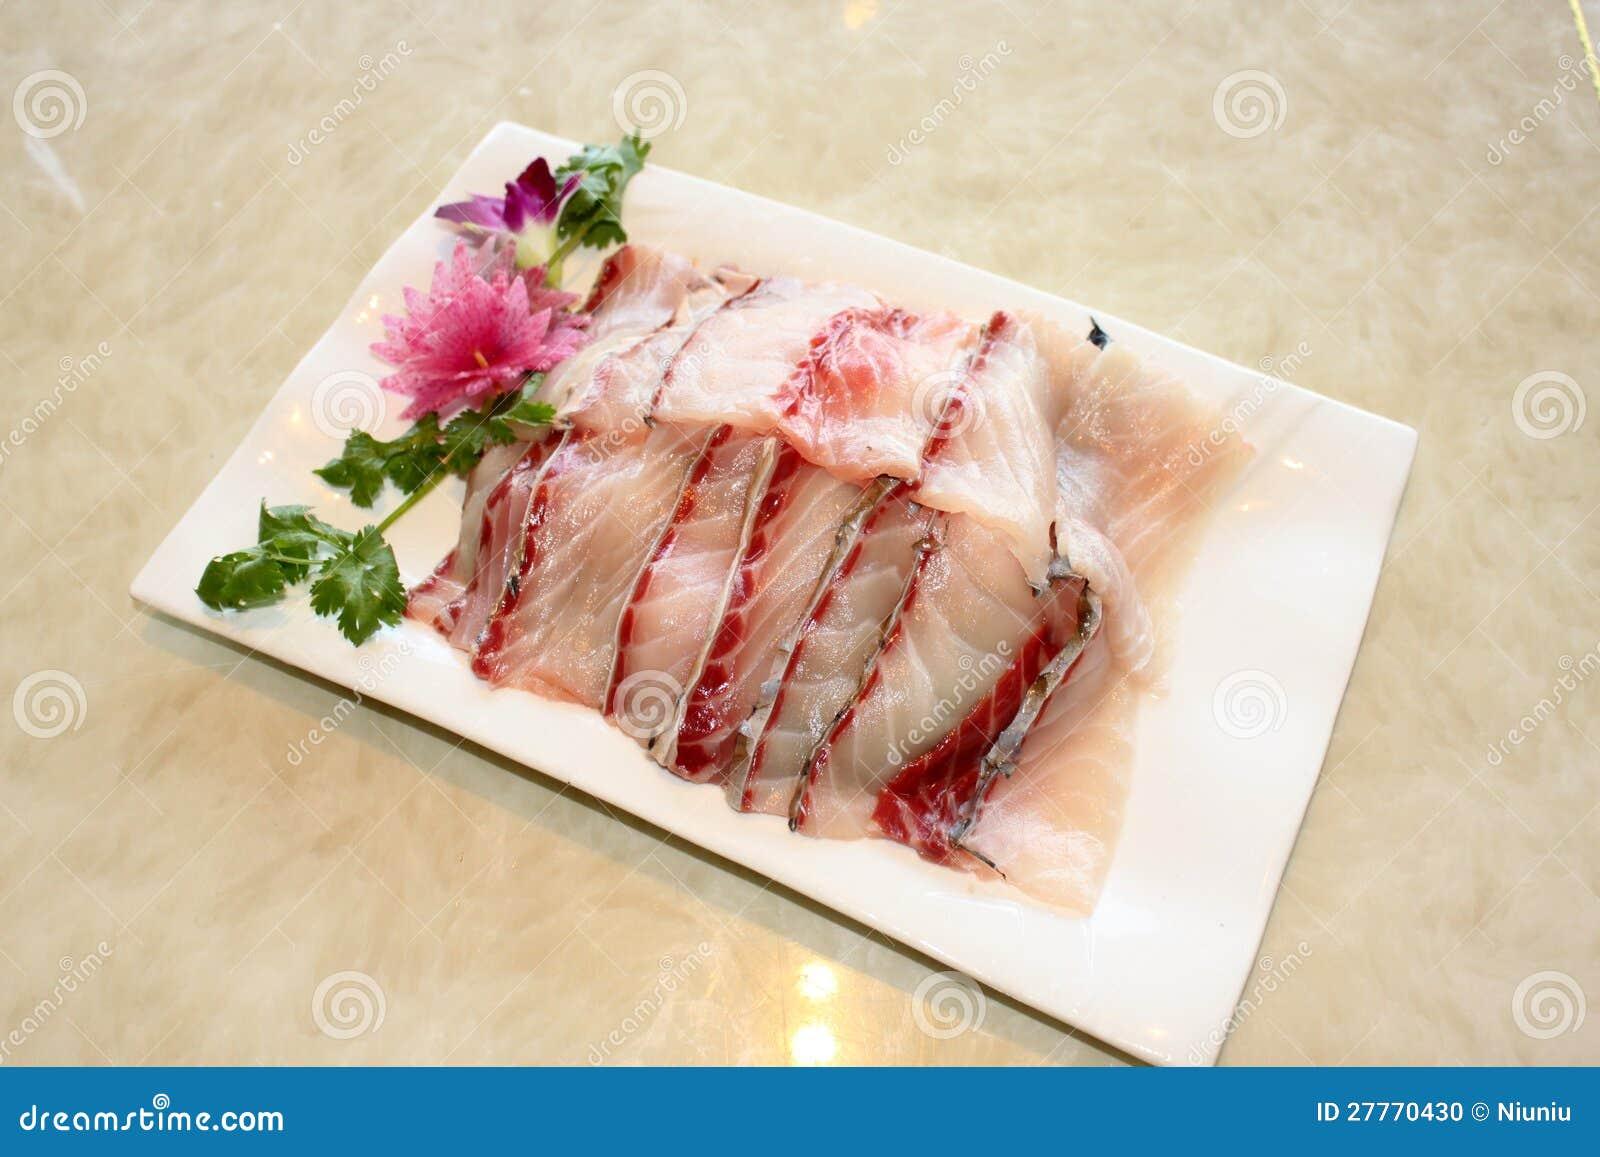 Le bac chaud bombe le sashimi